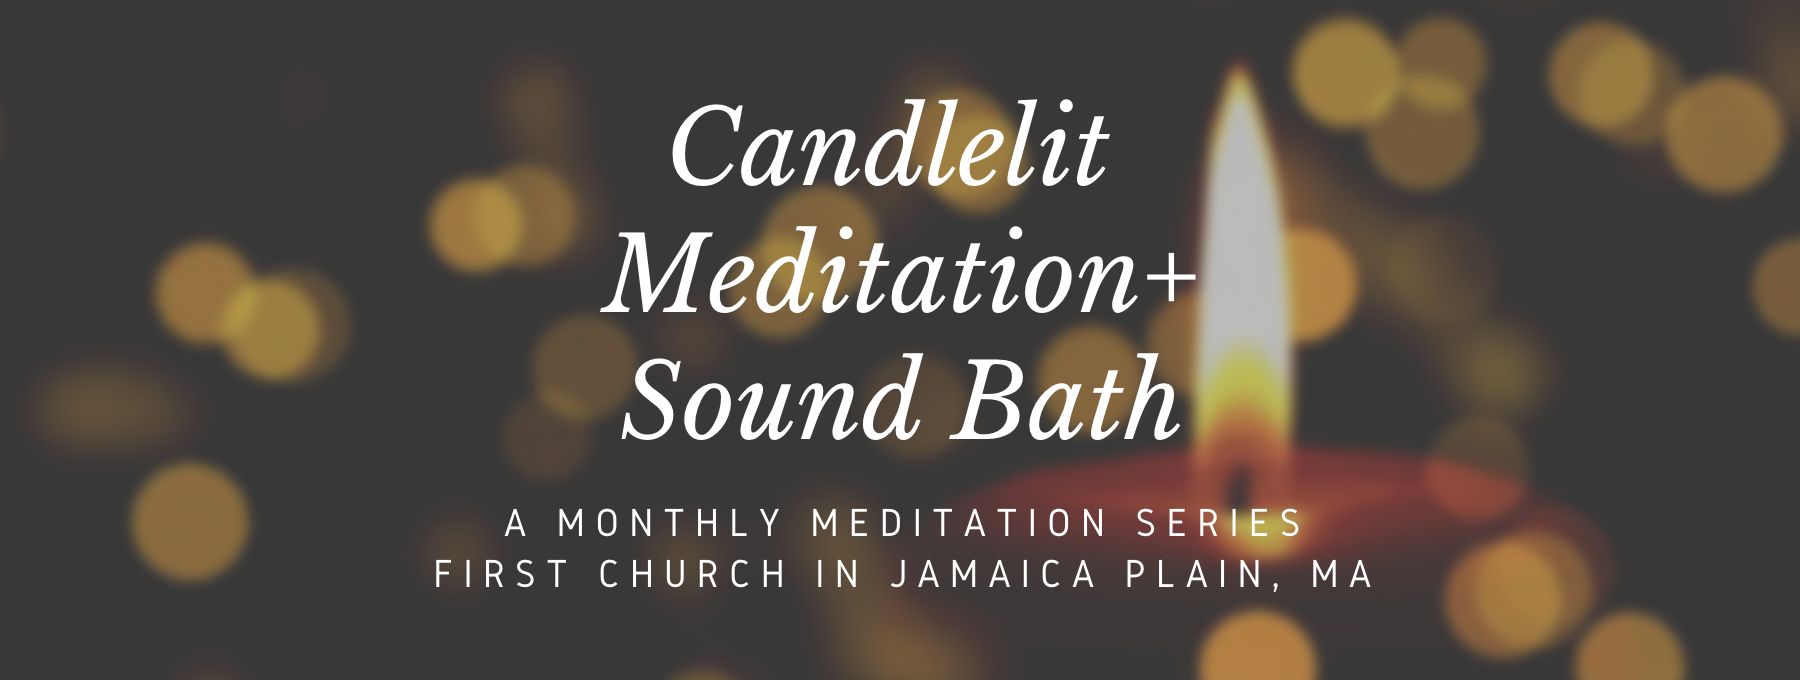 Candlelit Meditation & Sound Bath with Tara Atwood: First Church JP, Jamaica Plain, MA